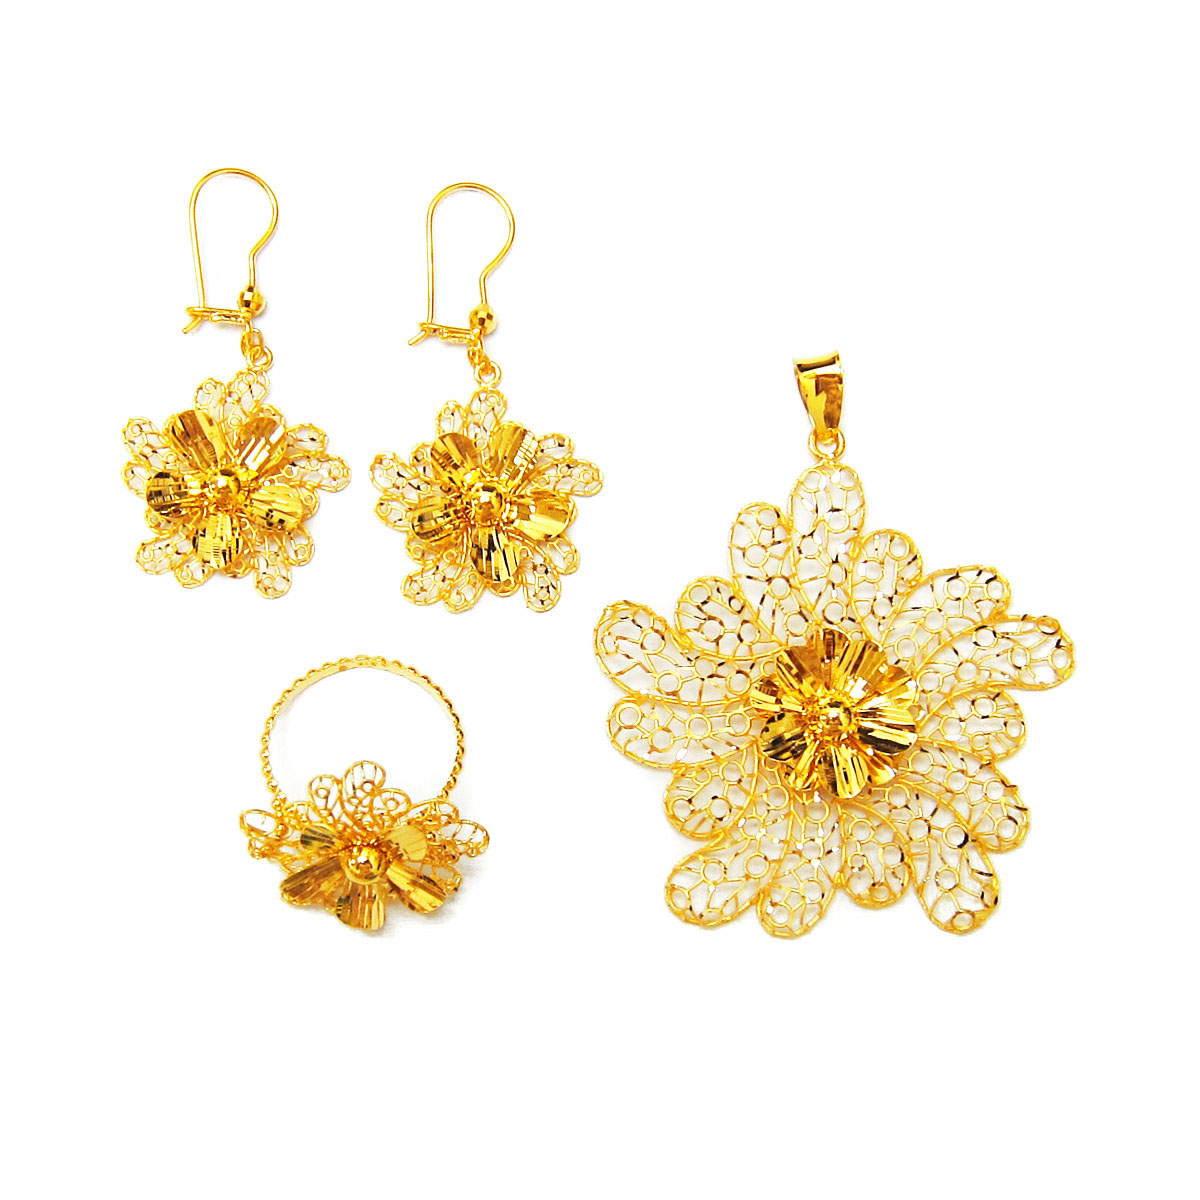 d718b077bb115 Dubai Middle East Arabic Pure Gold Jewelry Light Weight 18k 21k 22k Fine  Yellow Gold Jewellery Set